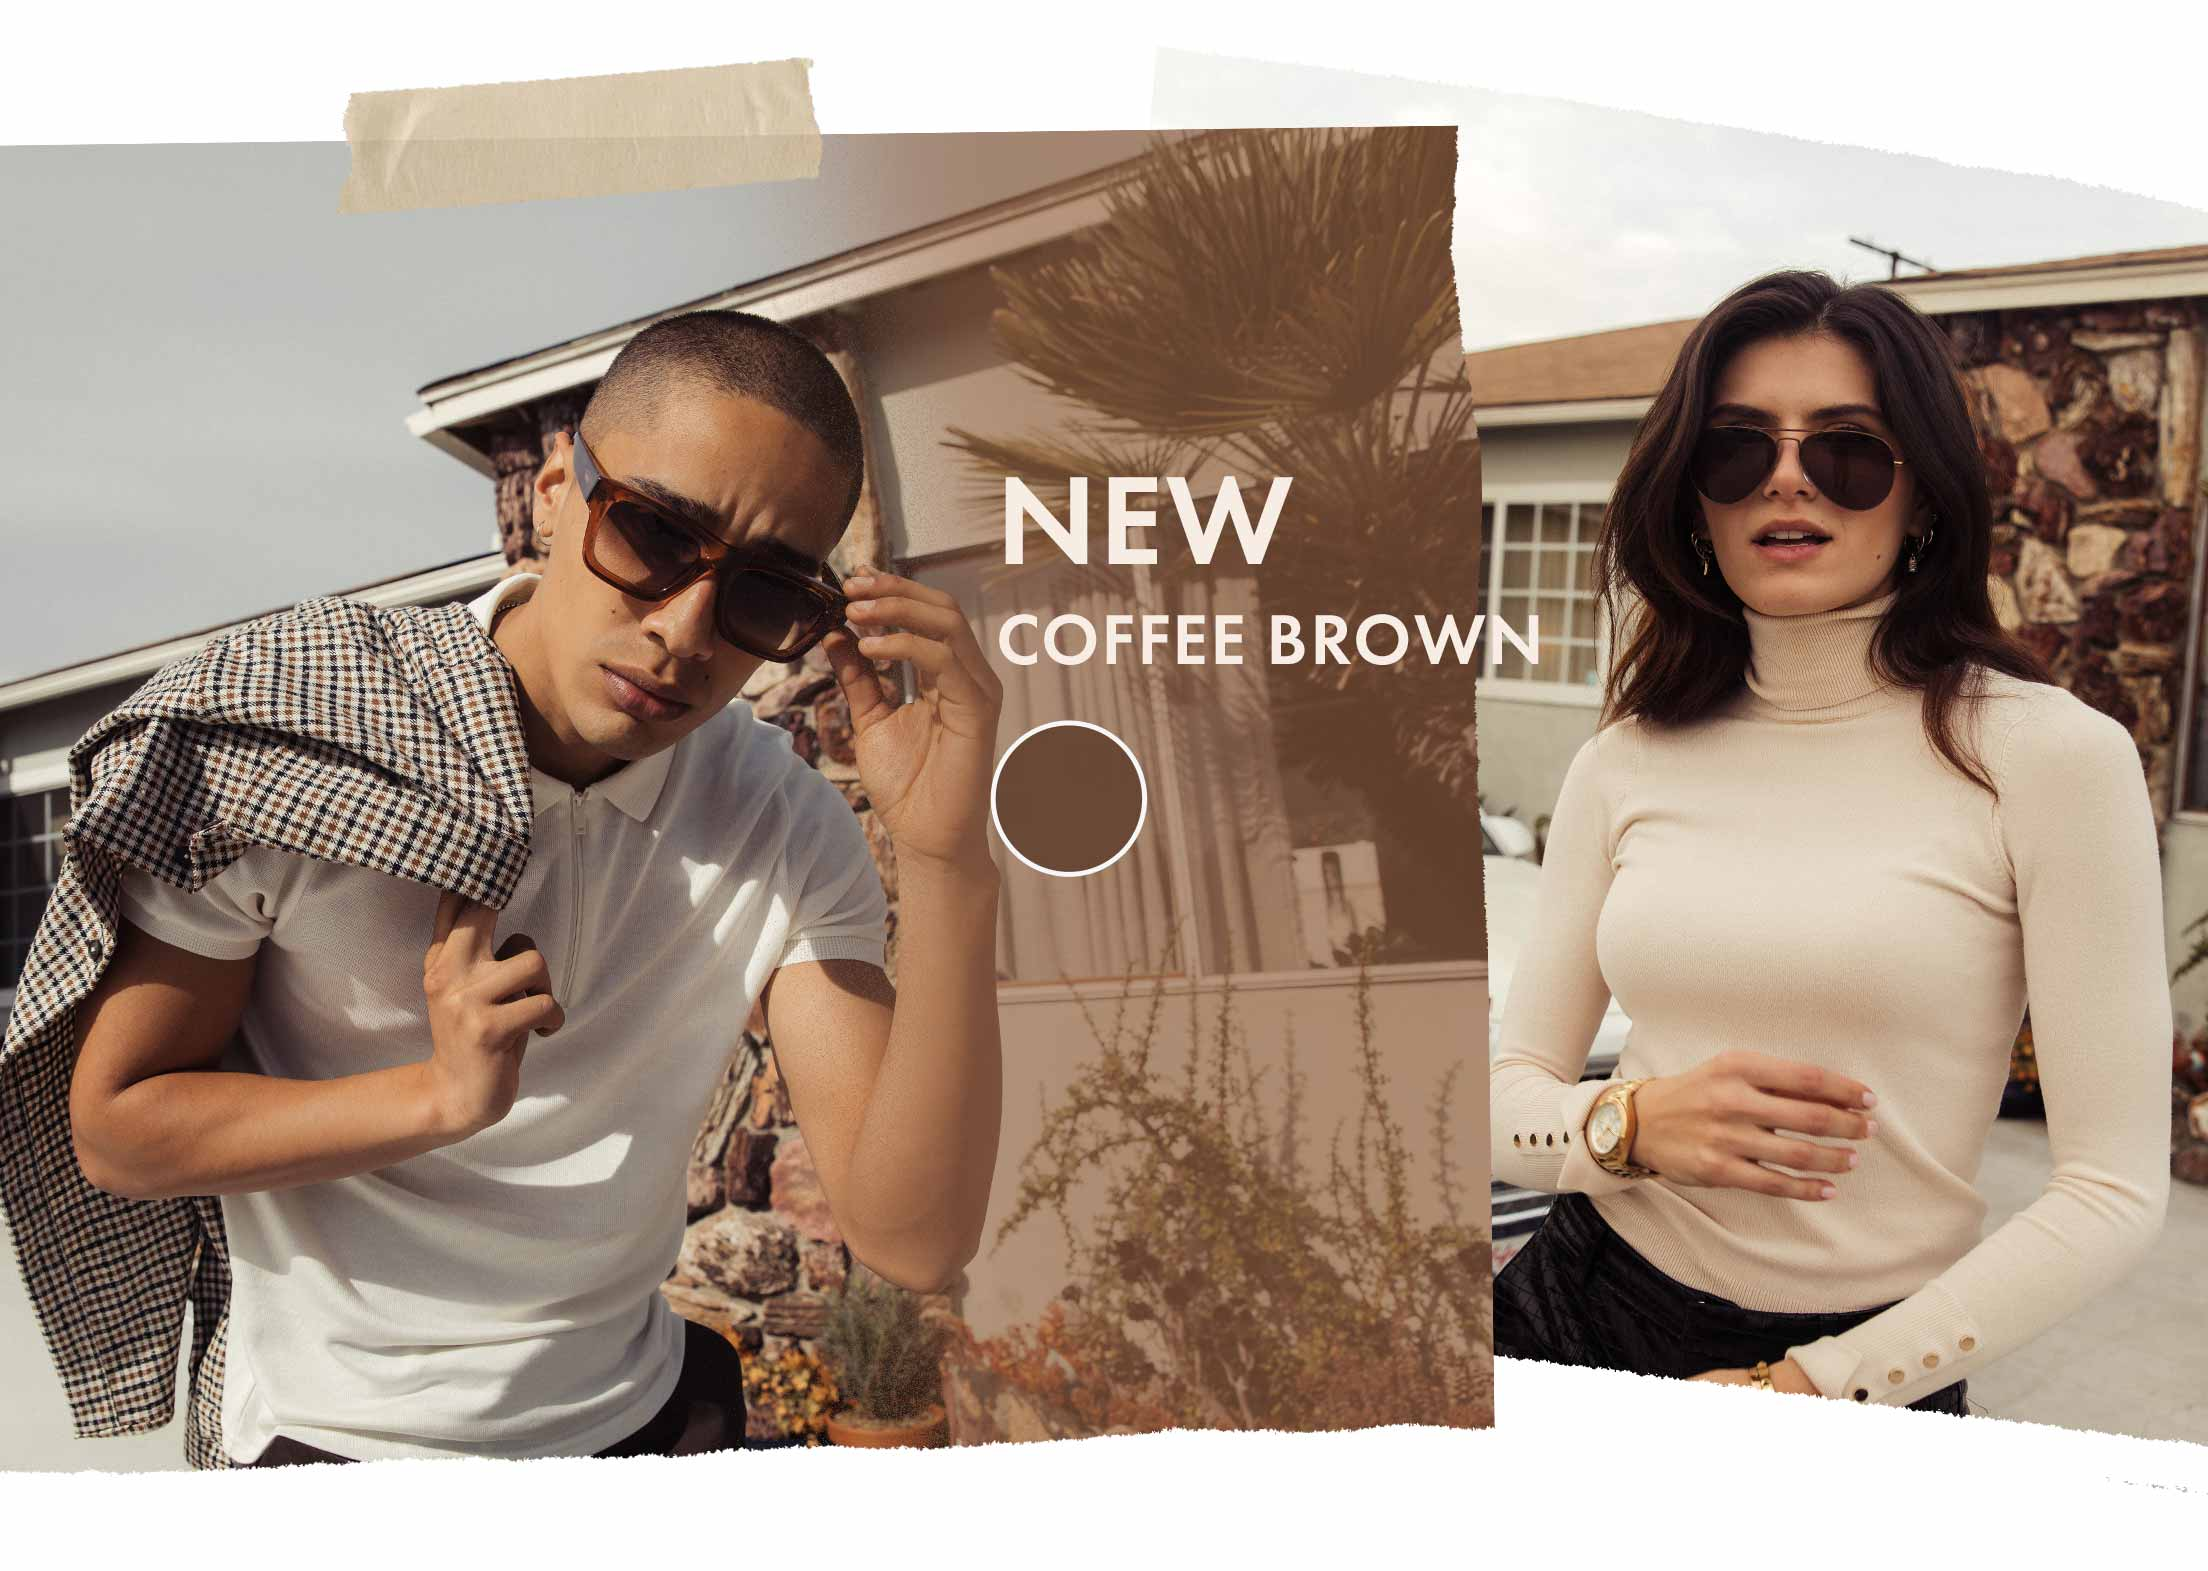 New: Coffee Brown